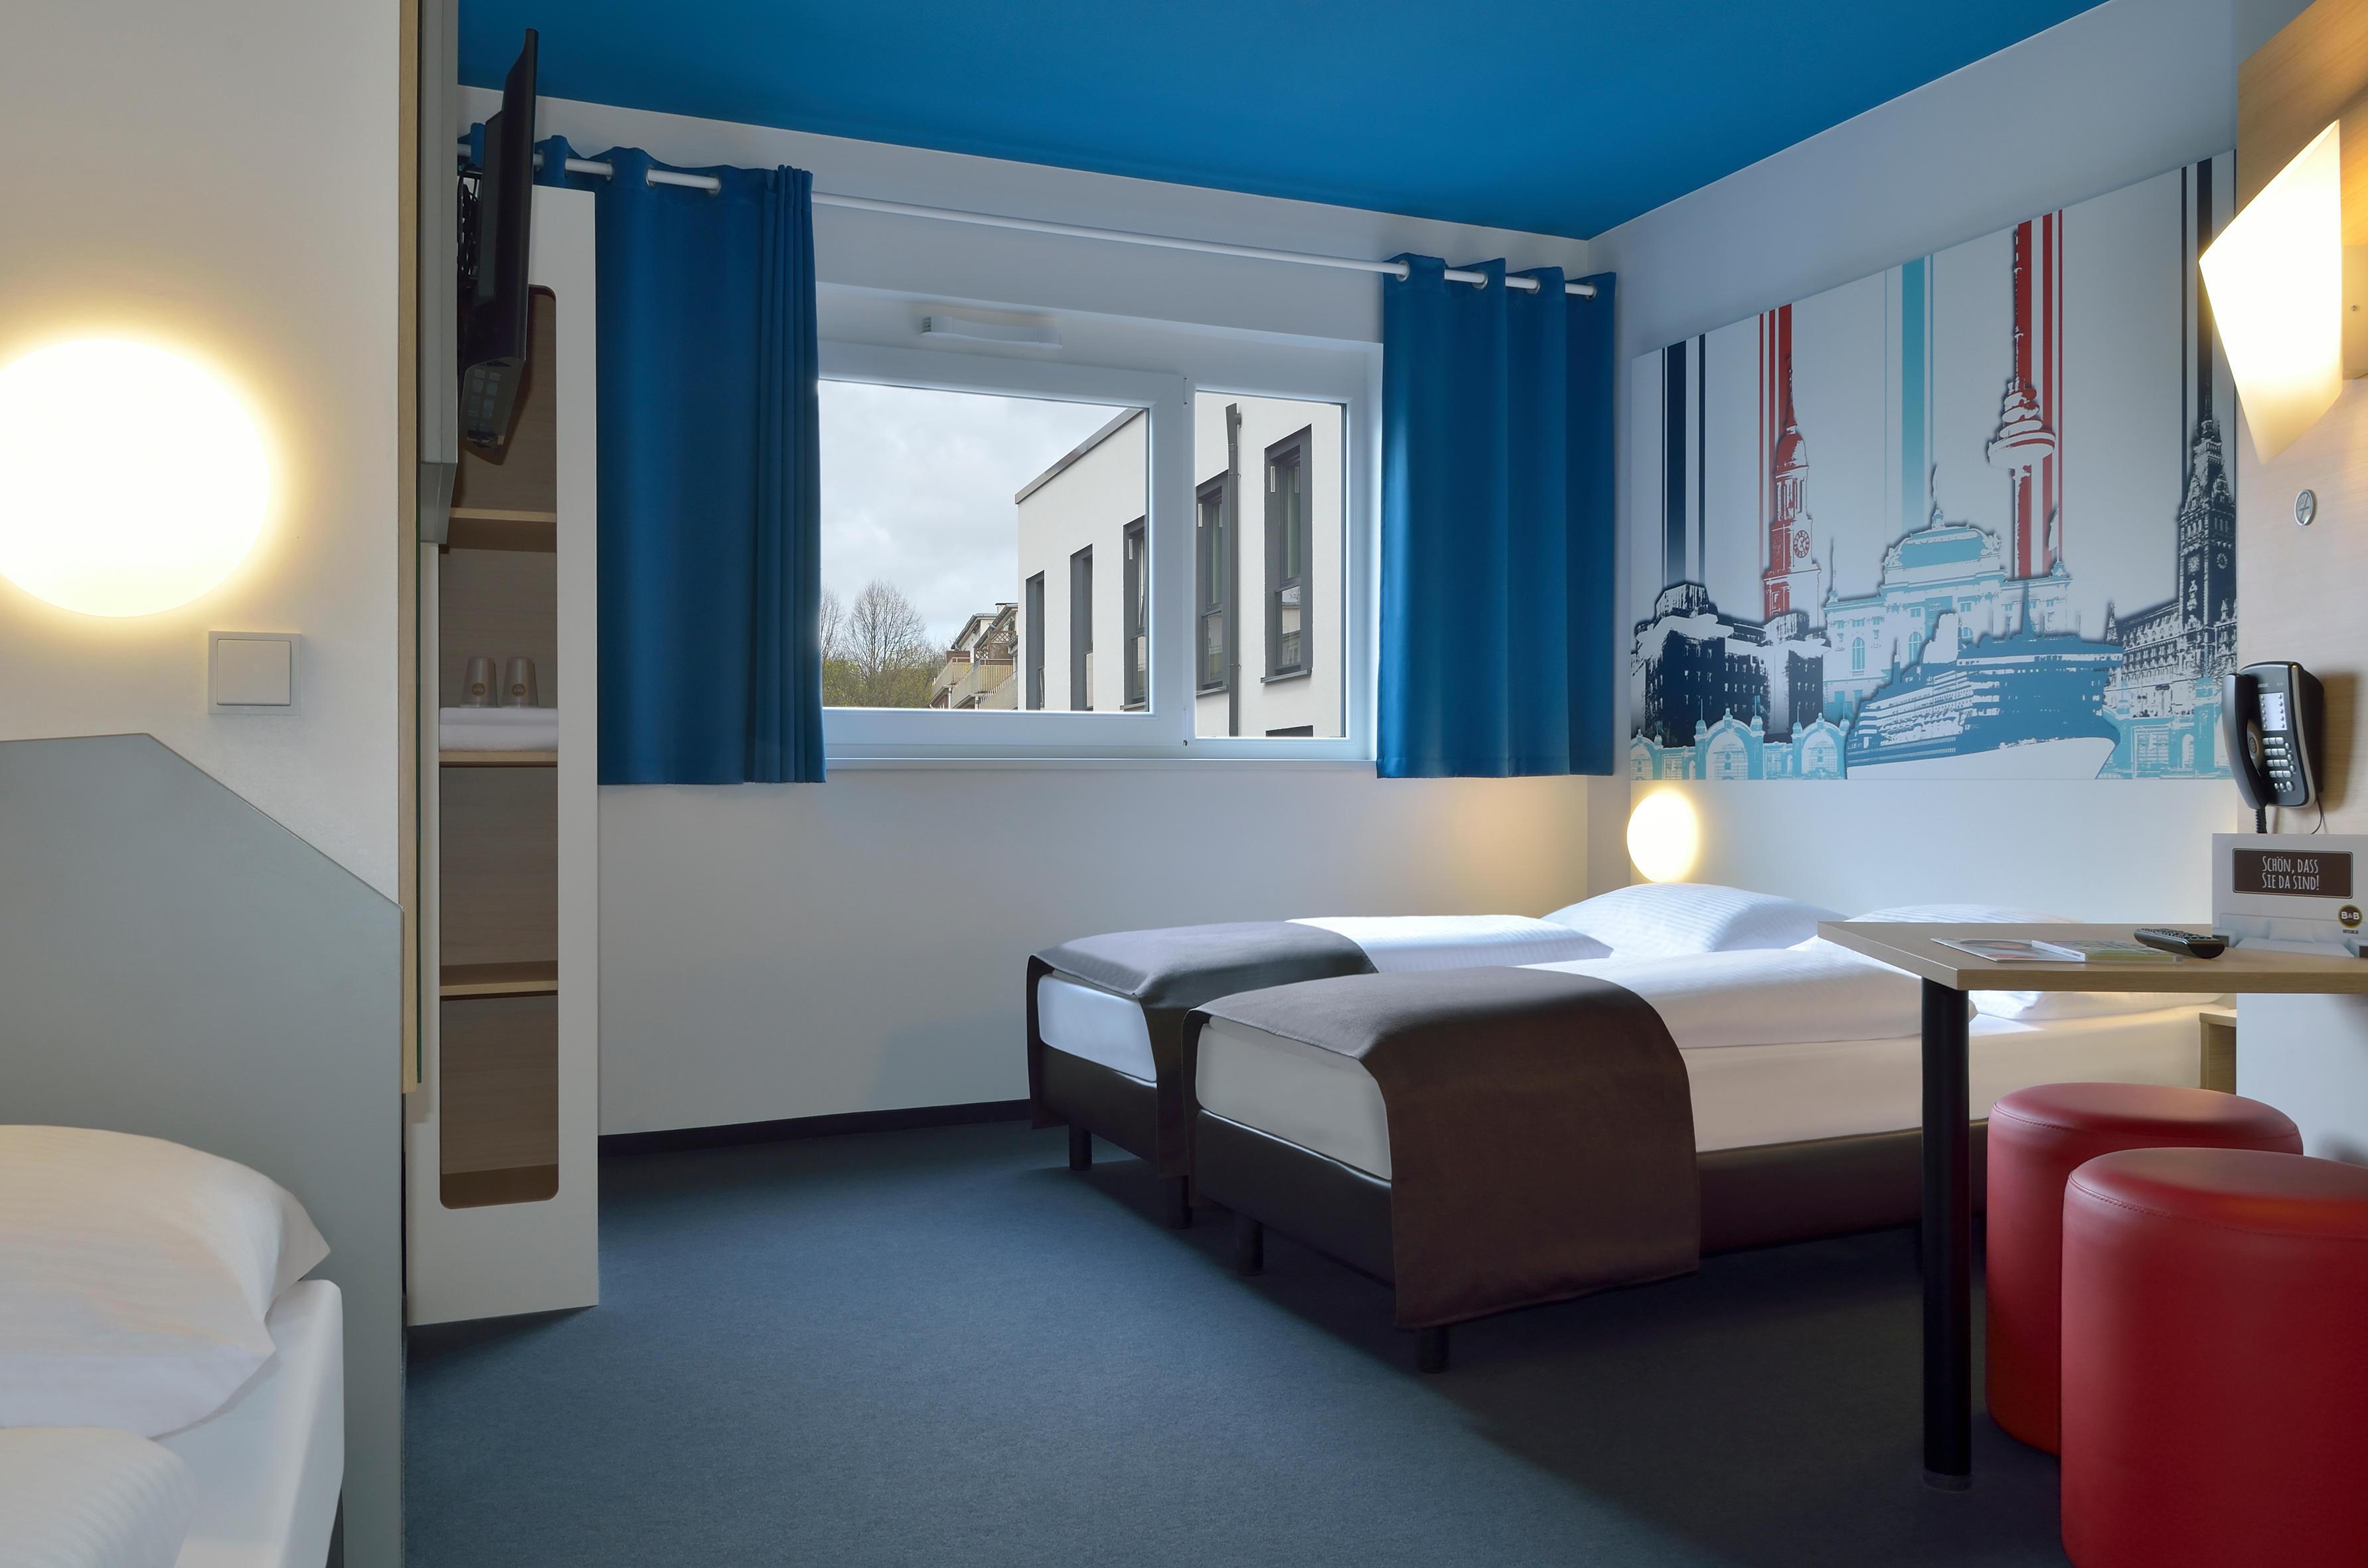 B Und B Hotel Hamburg City Ost